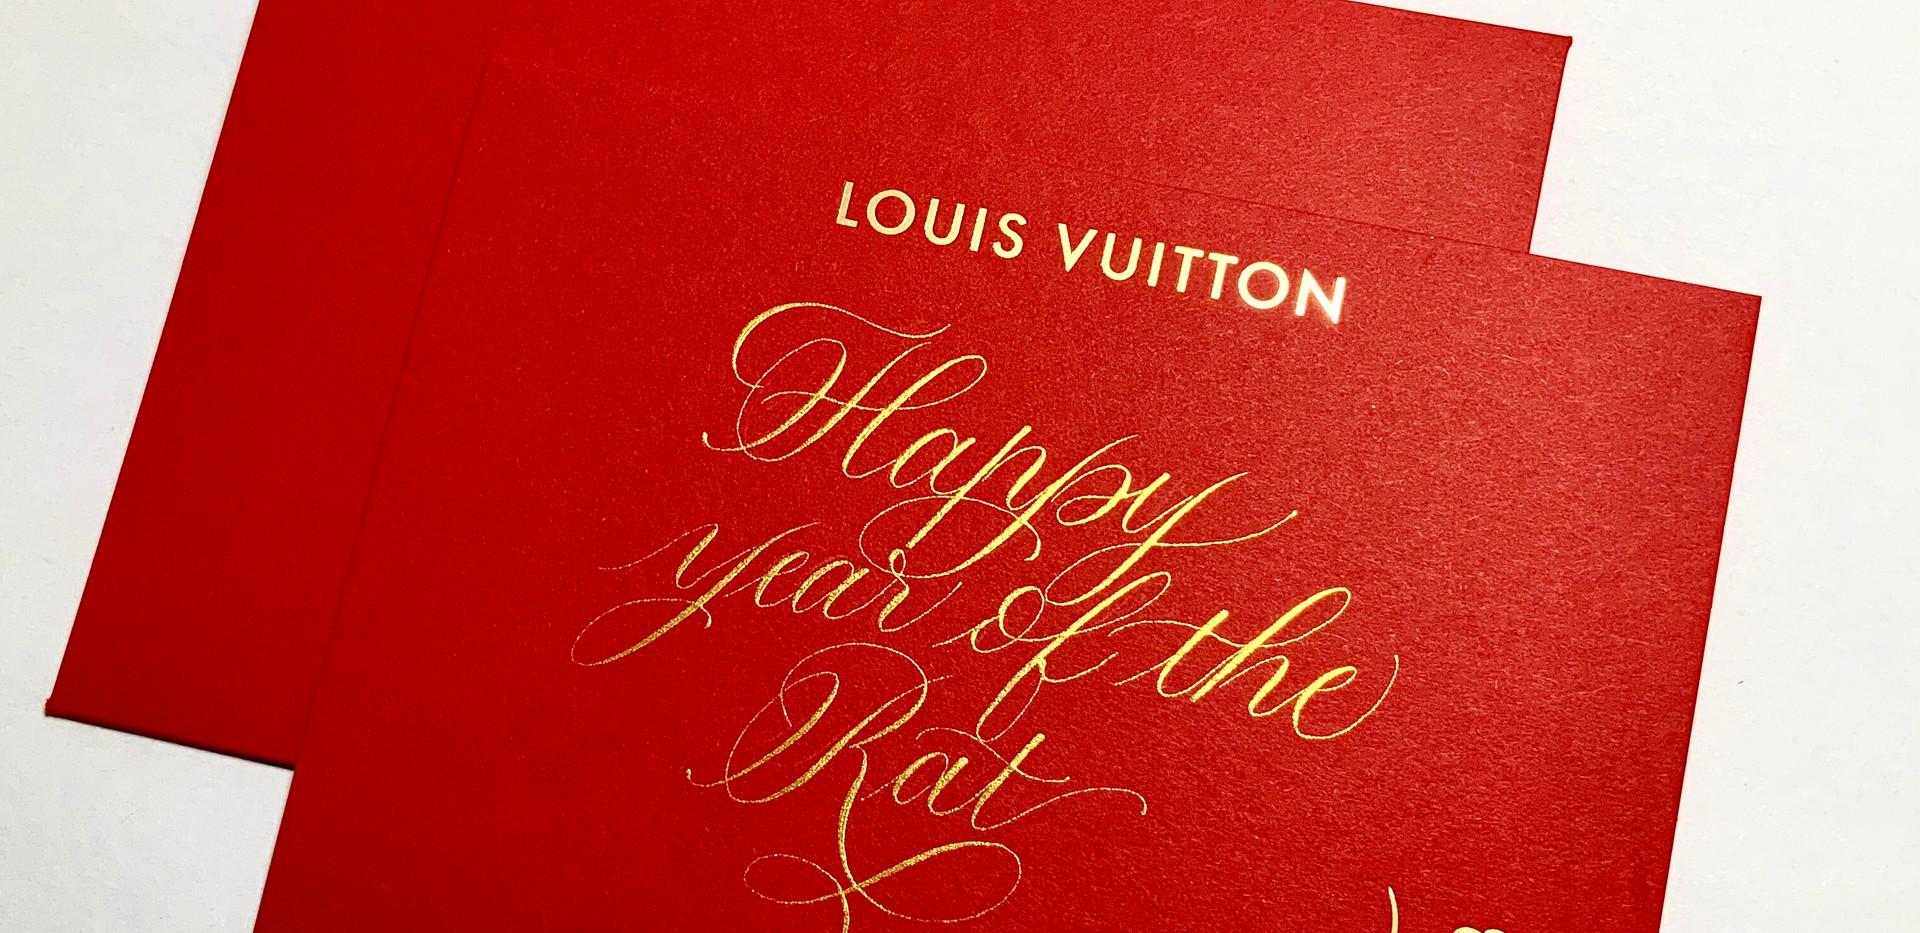 Louis Vuitton - Lunar New Year Event